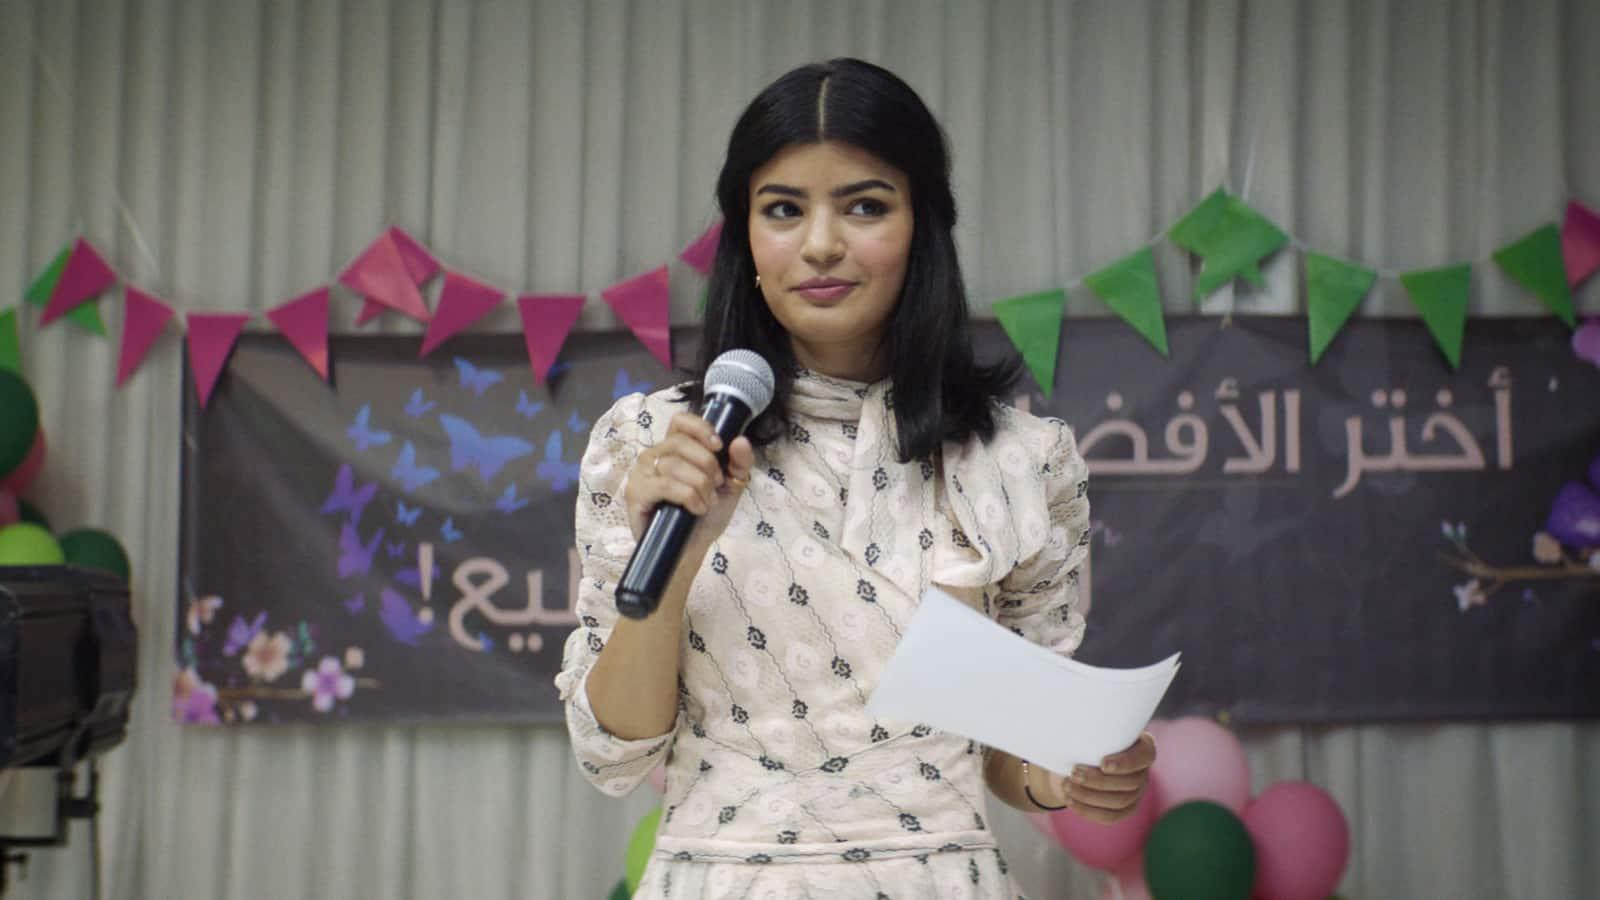 en-kvinnas-val-2019